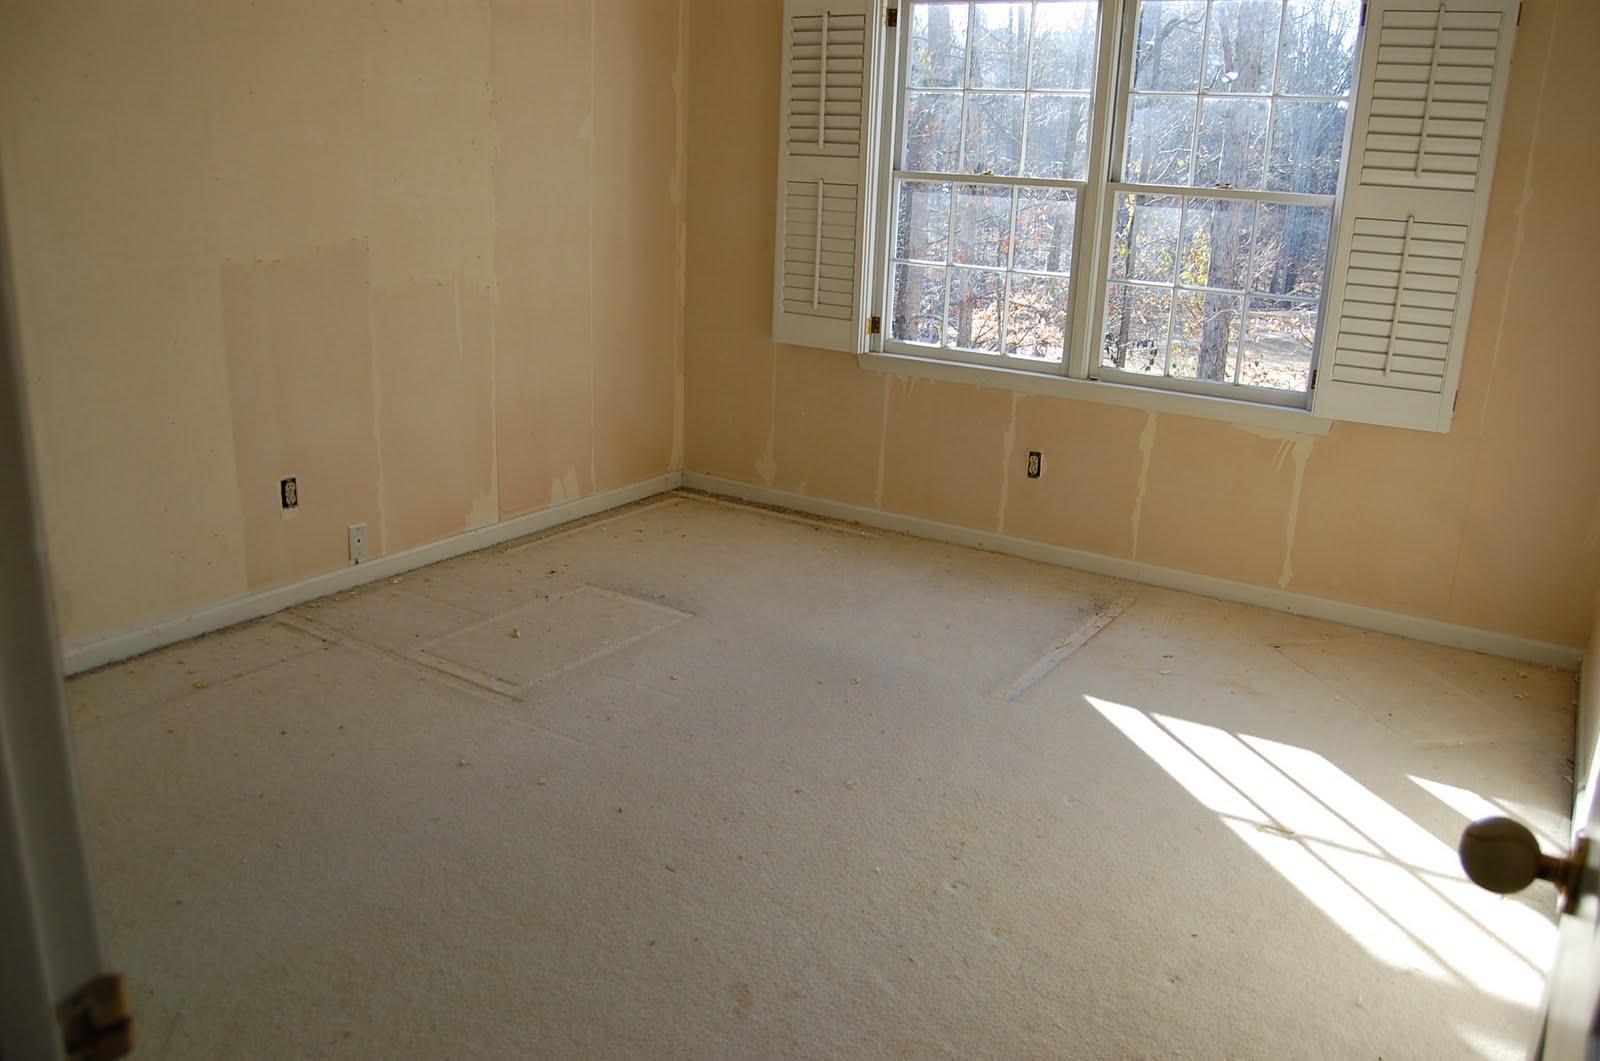 Installing hardwood floors part 1 for Laying hardwood floors